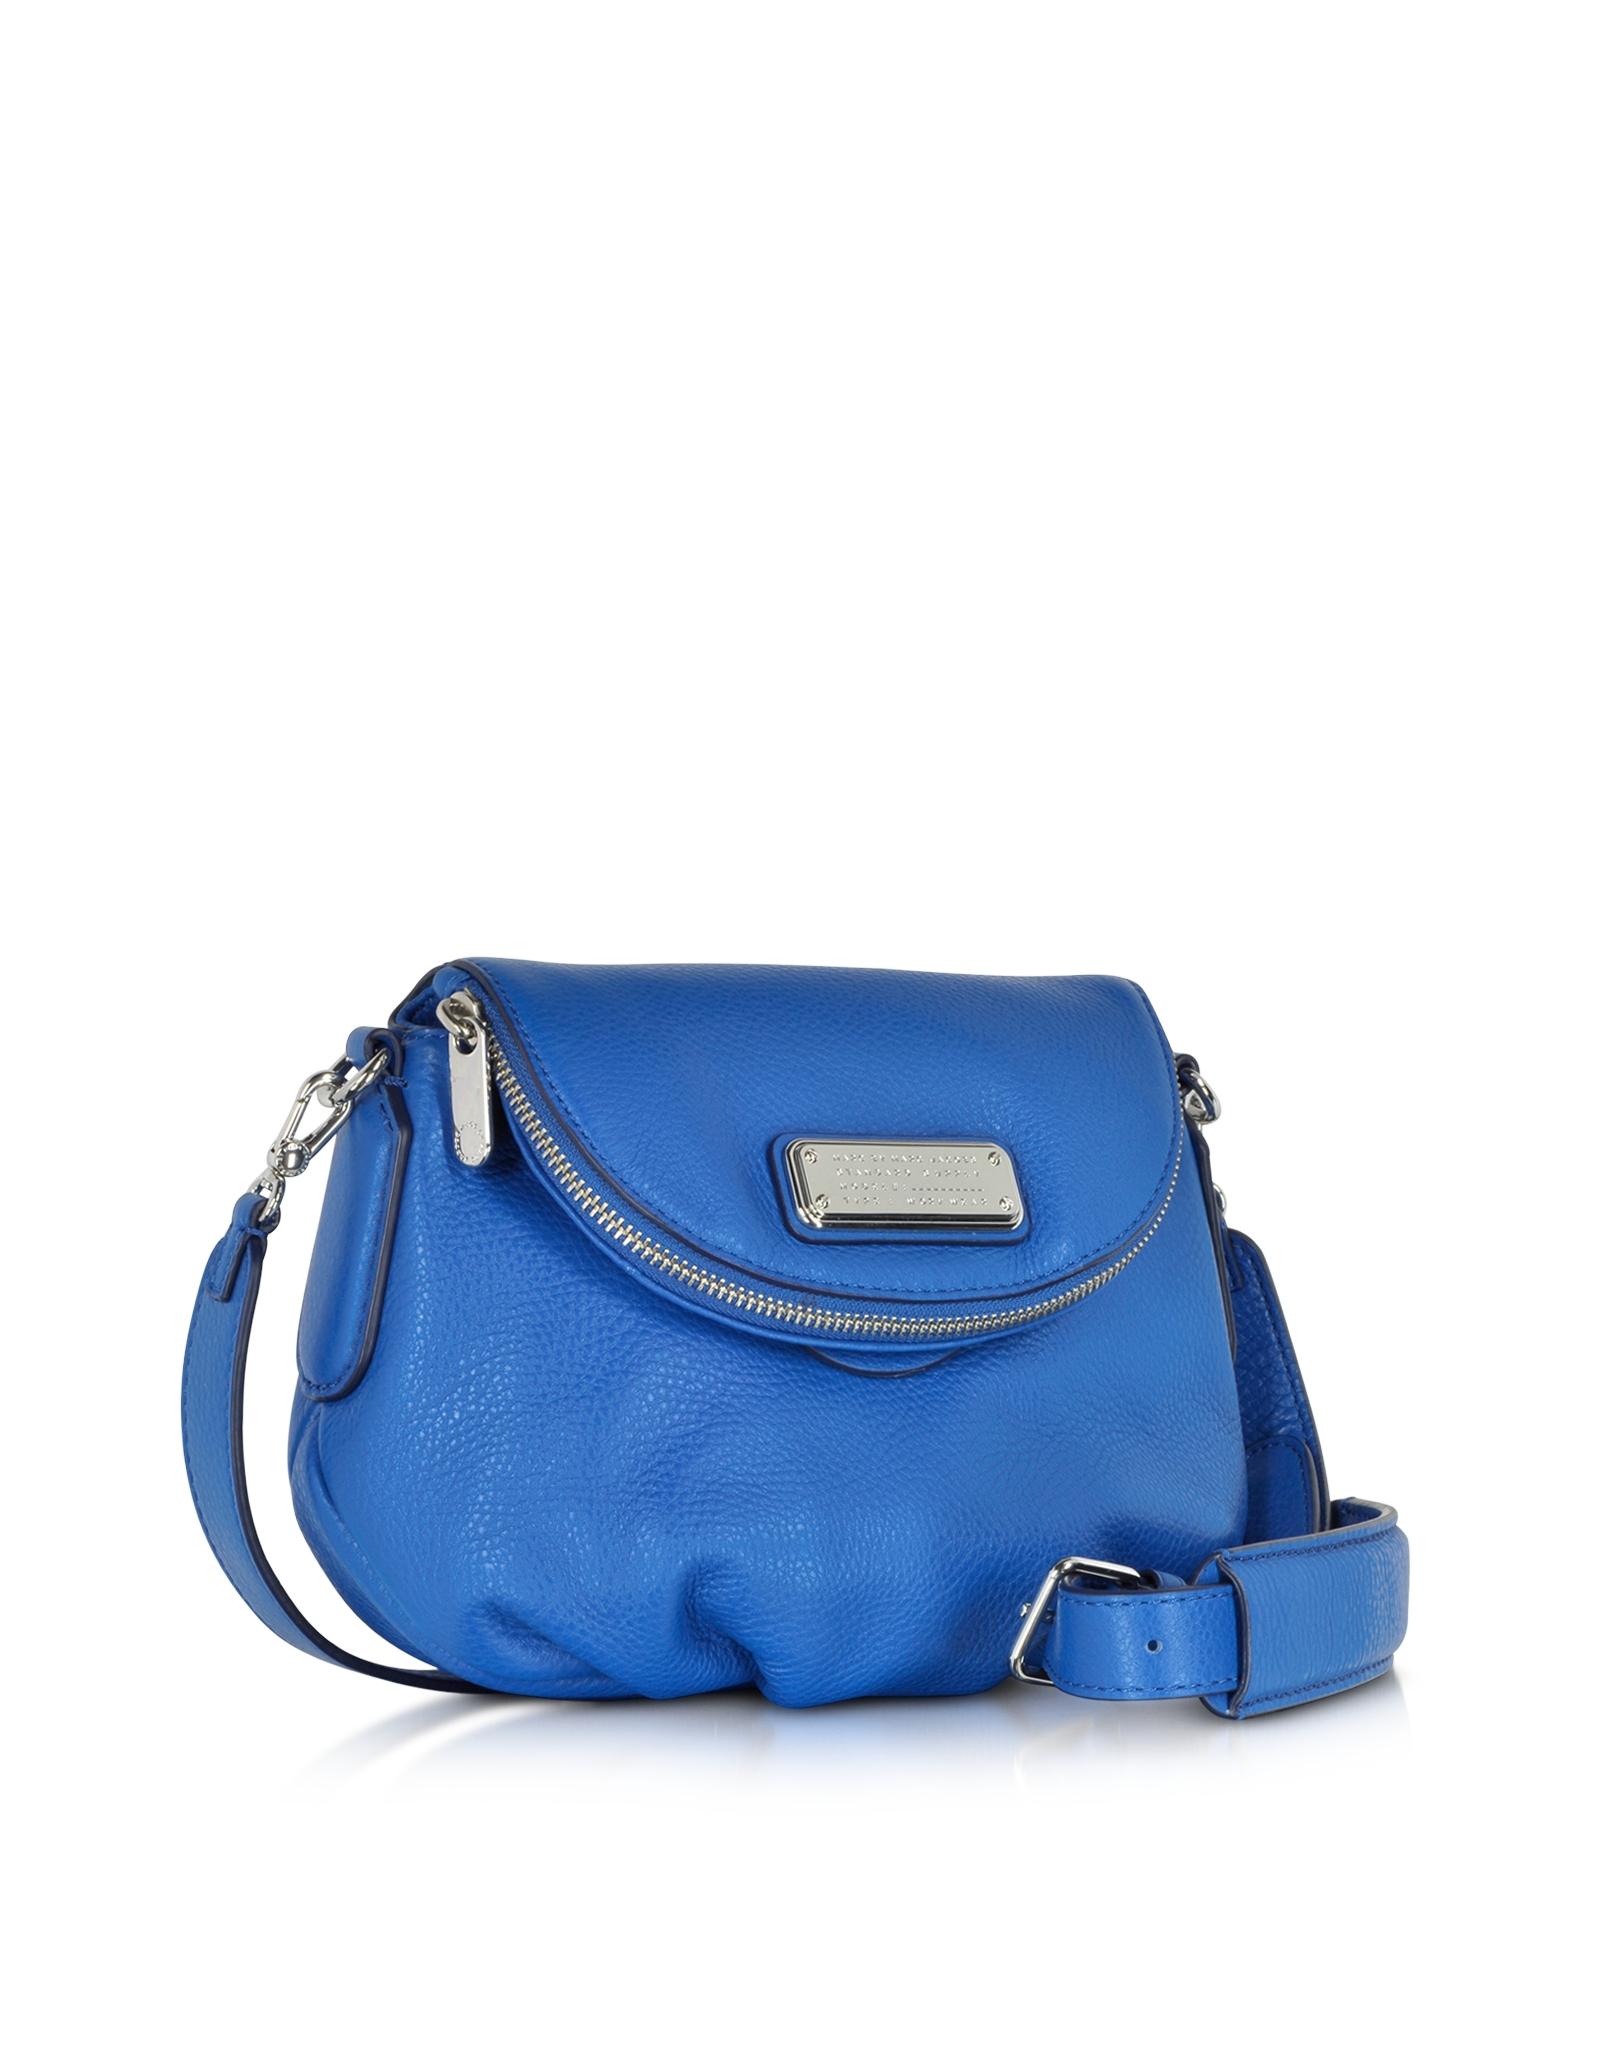 4e0478bef8f9 Lyst - Marc By Marc Jacobs New Q Mini Natasha Crossbody Bag in Blue